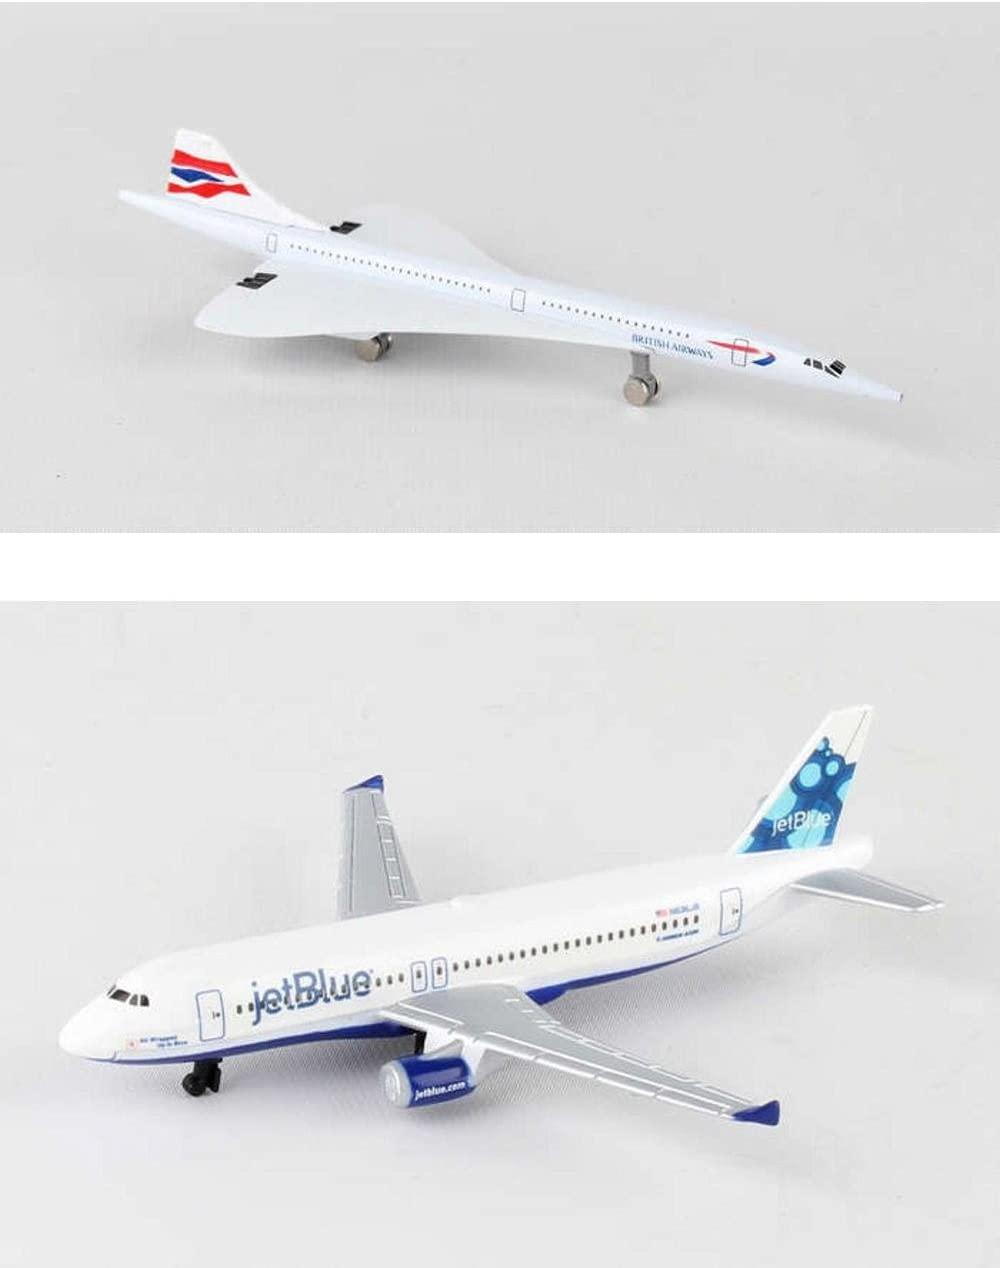 Daron British Airways Concorde, Jetblue Airlines Diecast Airplane Package - Two 5.5